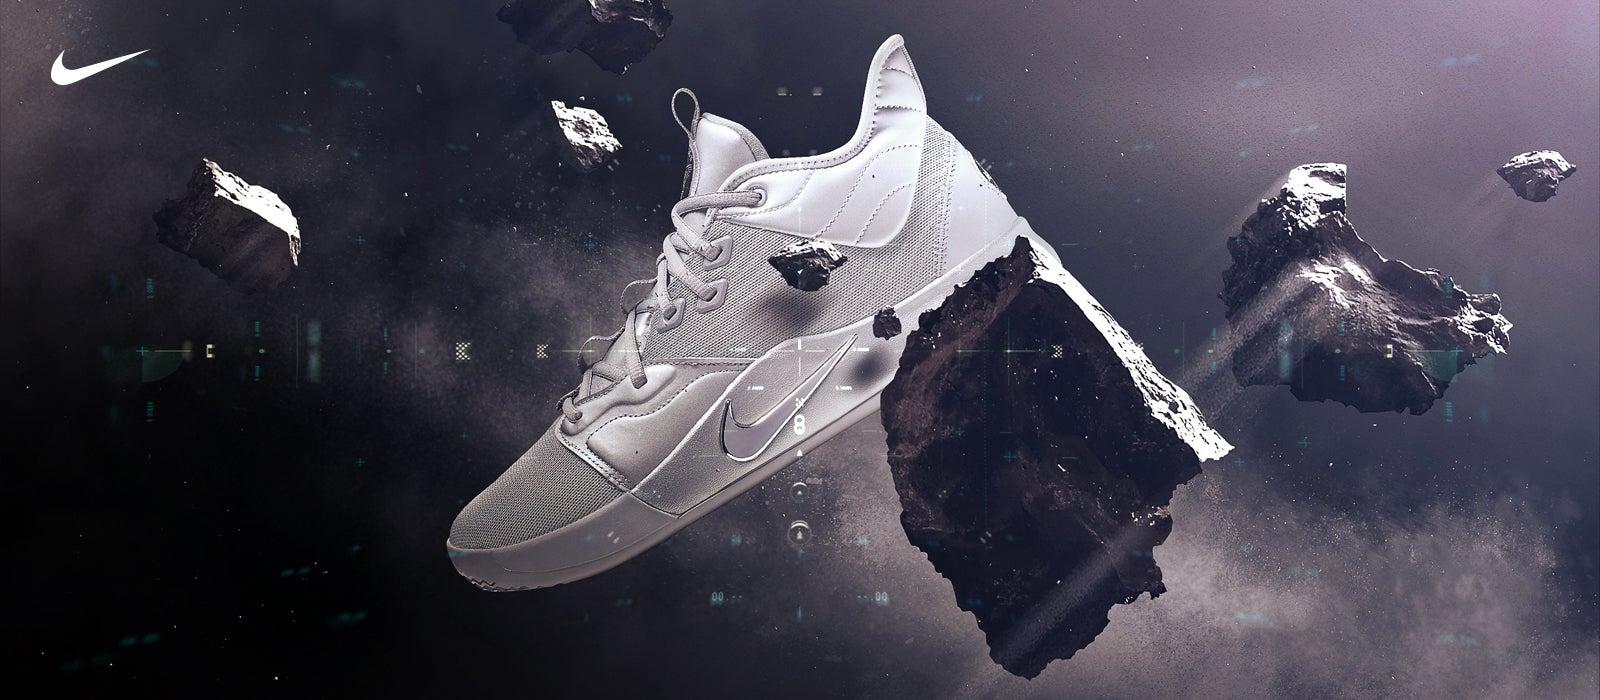 c6d3f625b97ff Approved | Sneakers, Apparel & More | Foot Locker